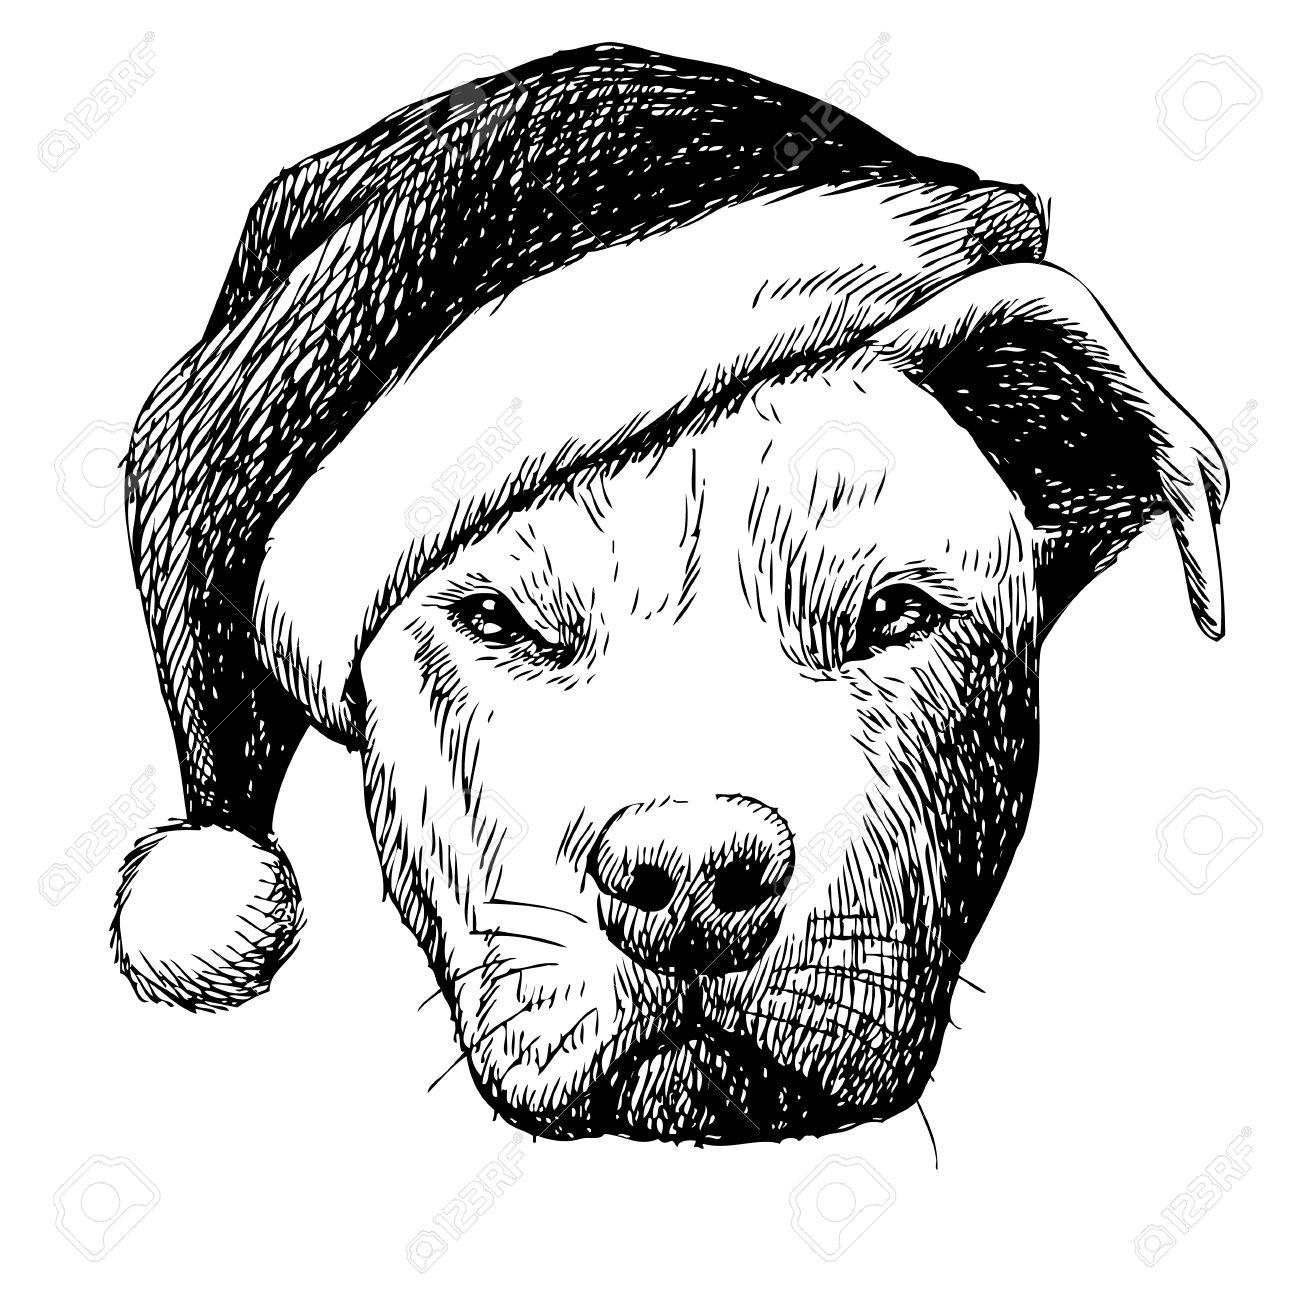 1300x1300 Pitbull Dog Images Drawing